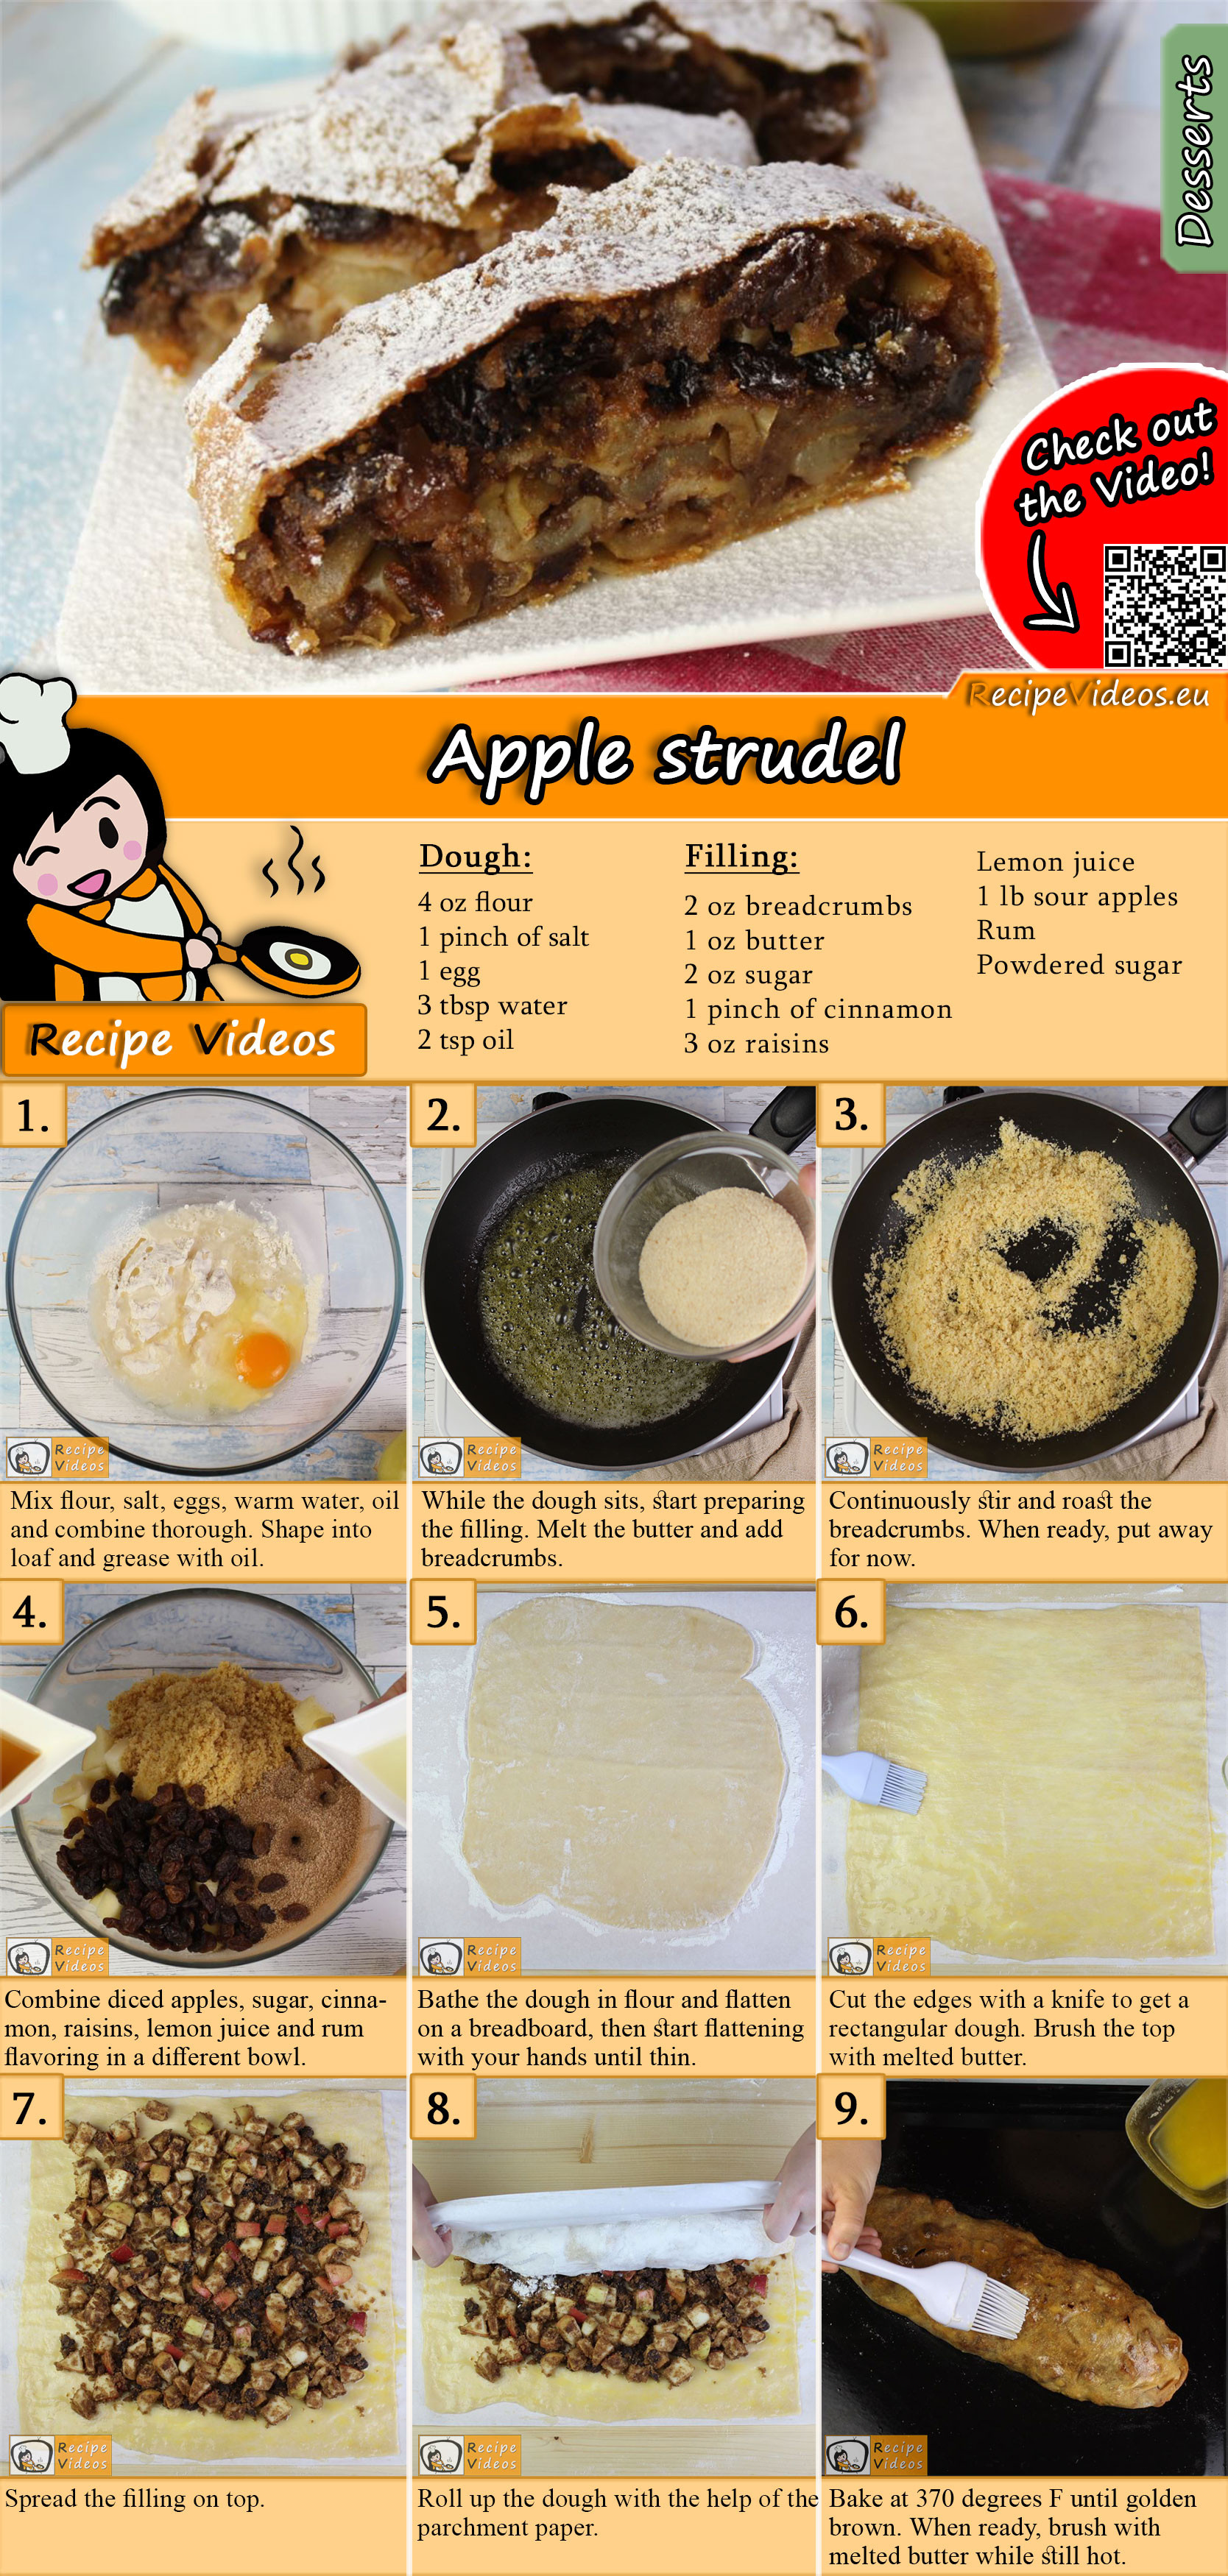 Apple strudel recipe with video